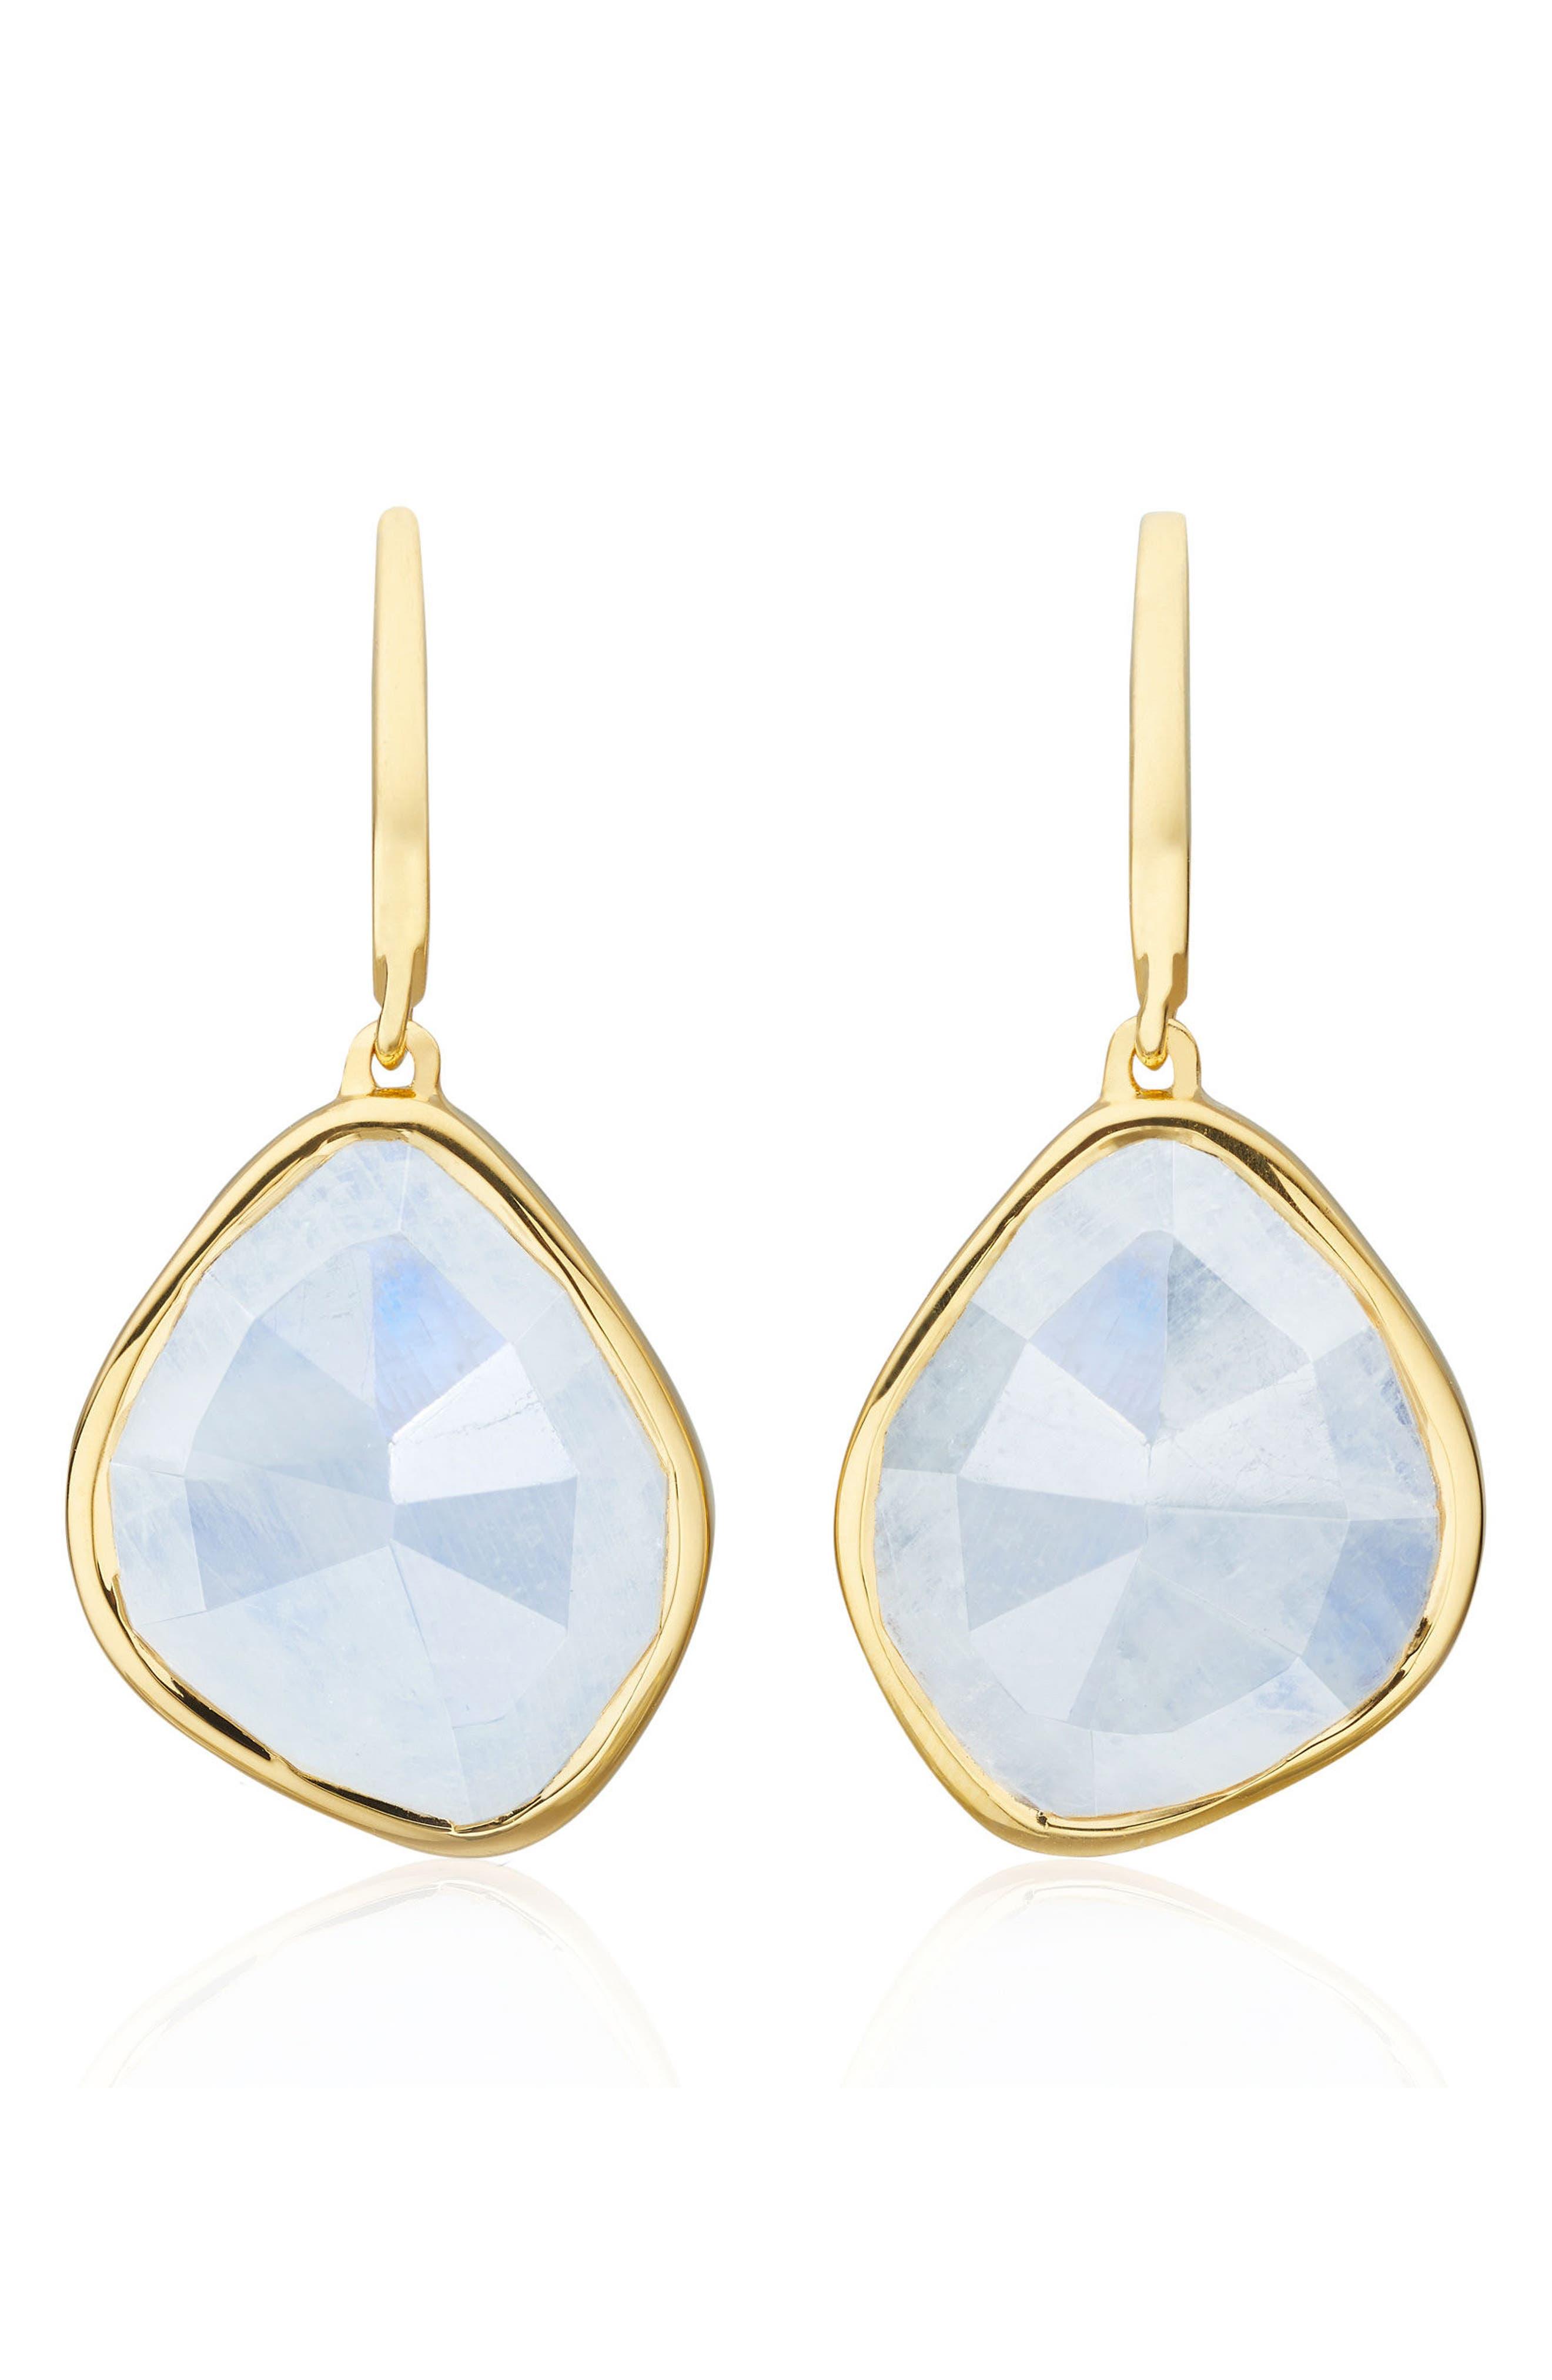 Monica Vinader Siren Nugget Semiprecious Stone Drop Earrings